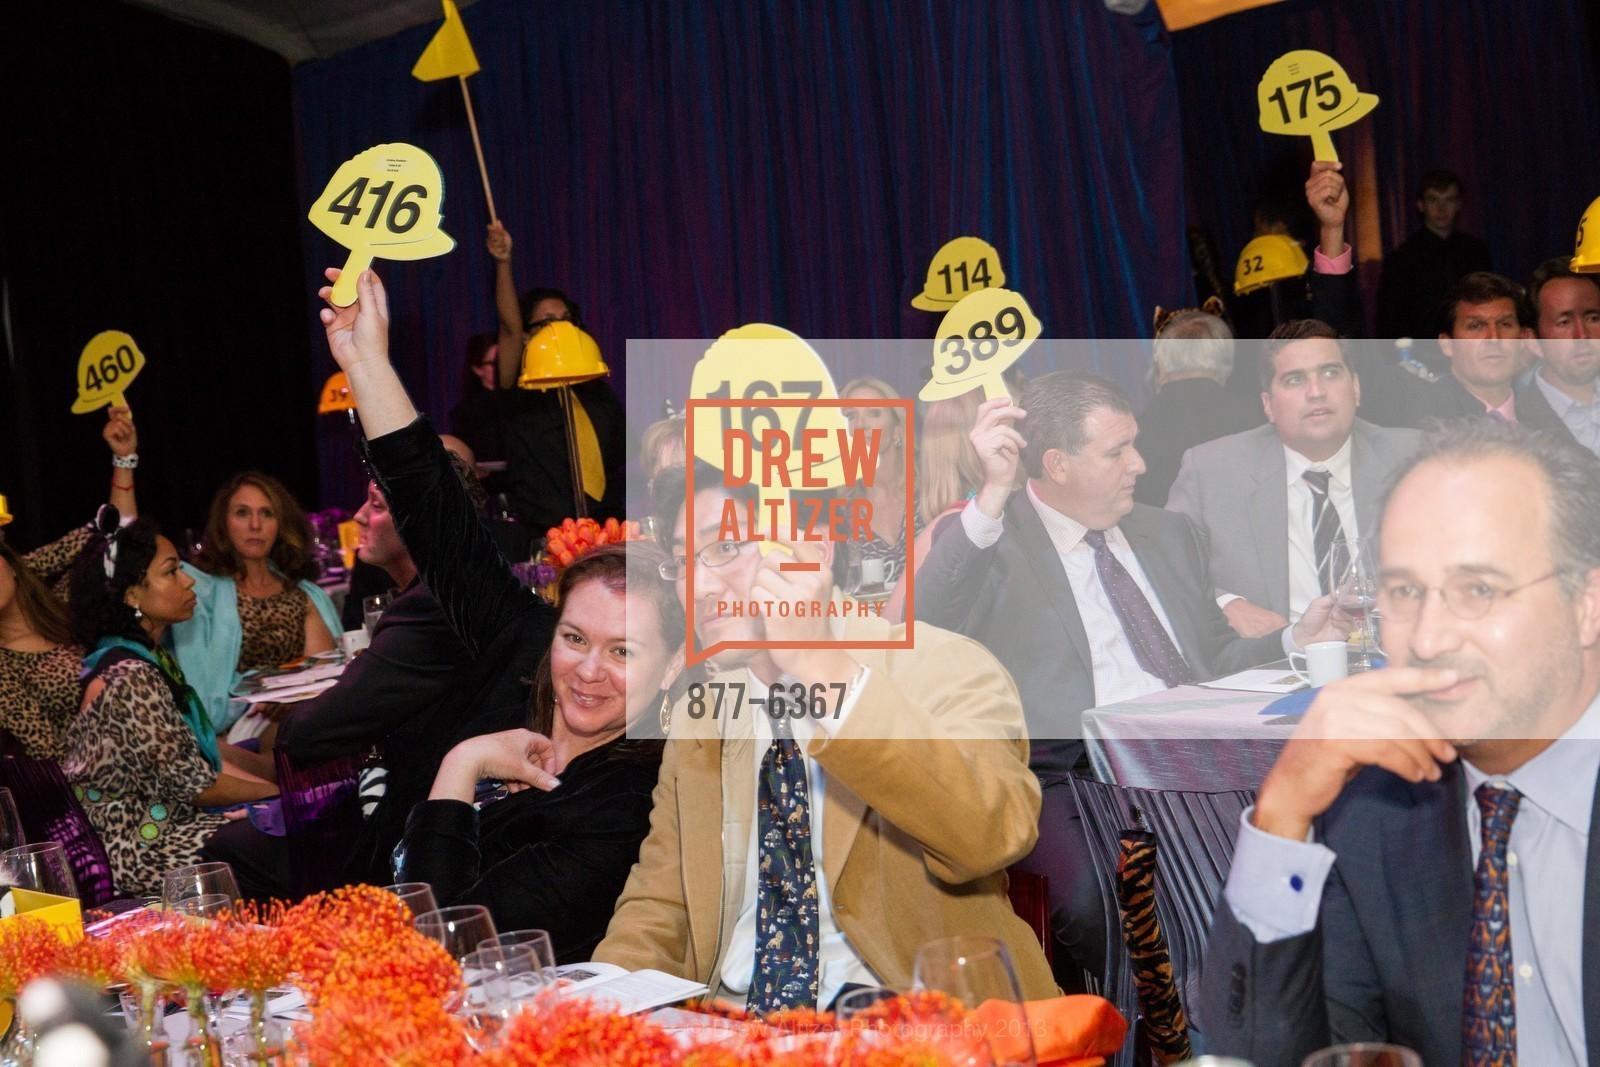 Serena Fairchild, David Chung, Oran Muduroglu, ZooFest 2013 Hard Hat & Tails, US, May 11th, 2013,Drew Altizer, Drew Altizer Photography, full-service agency, private events, San Francisco photographer, photographer california